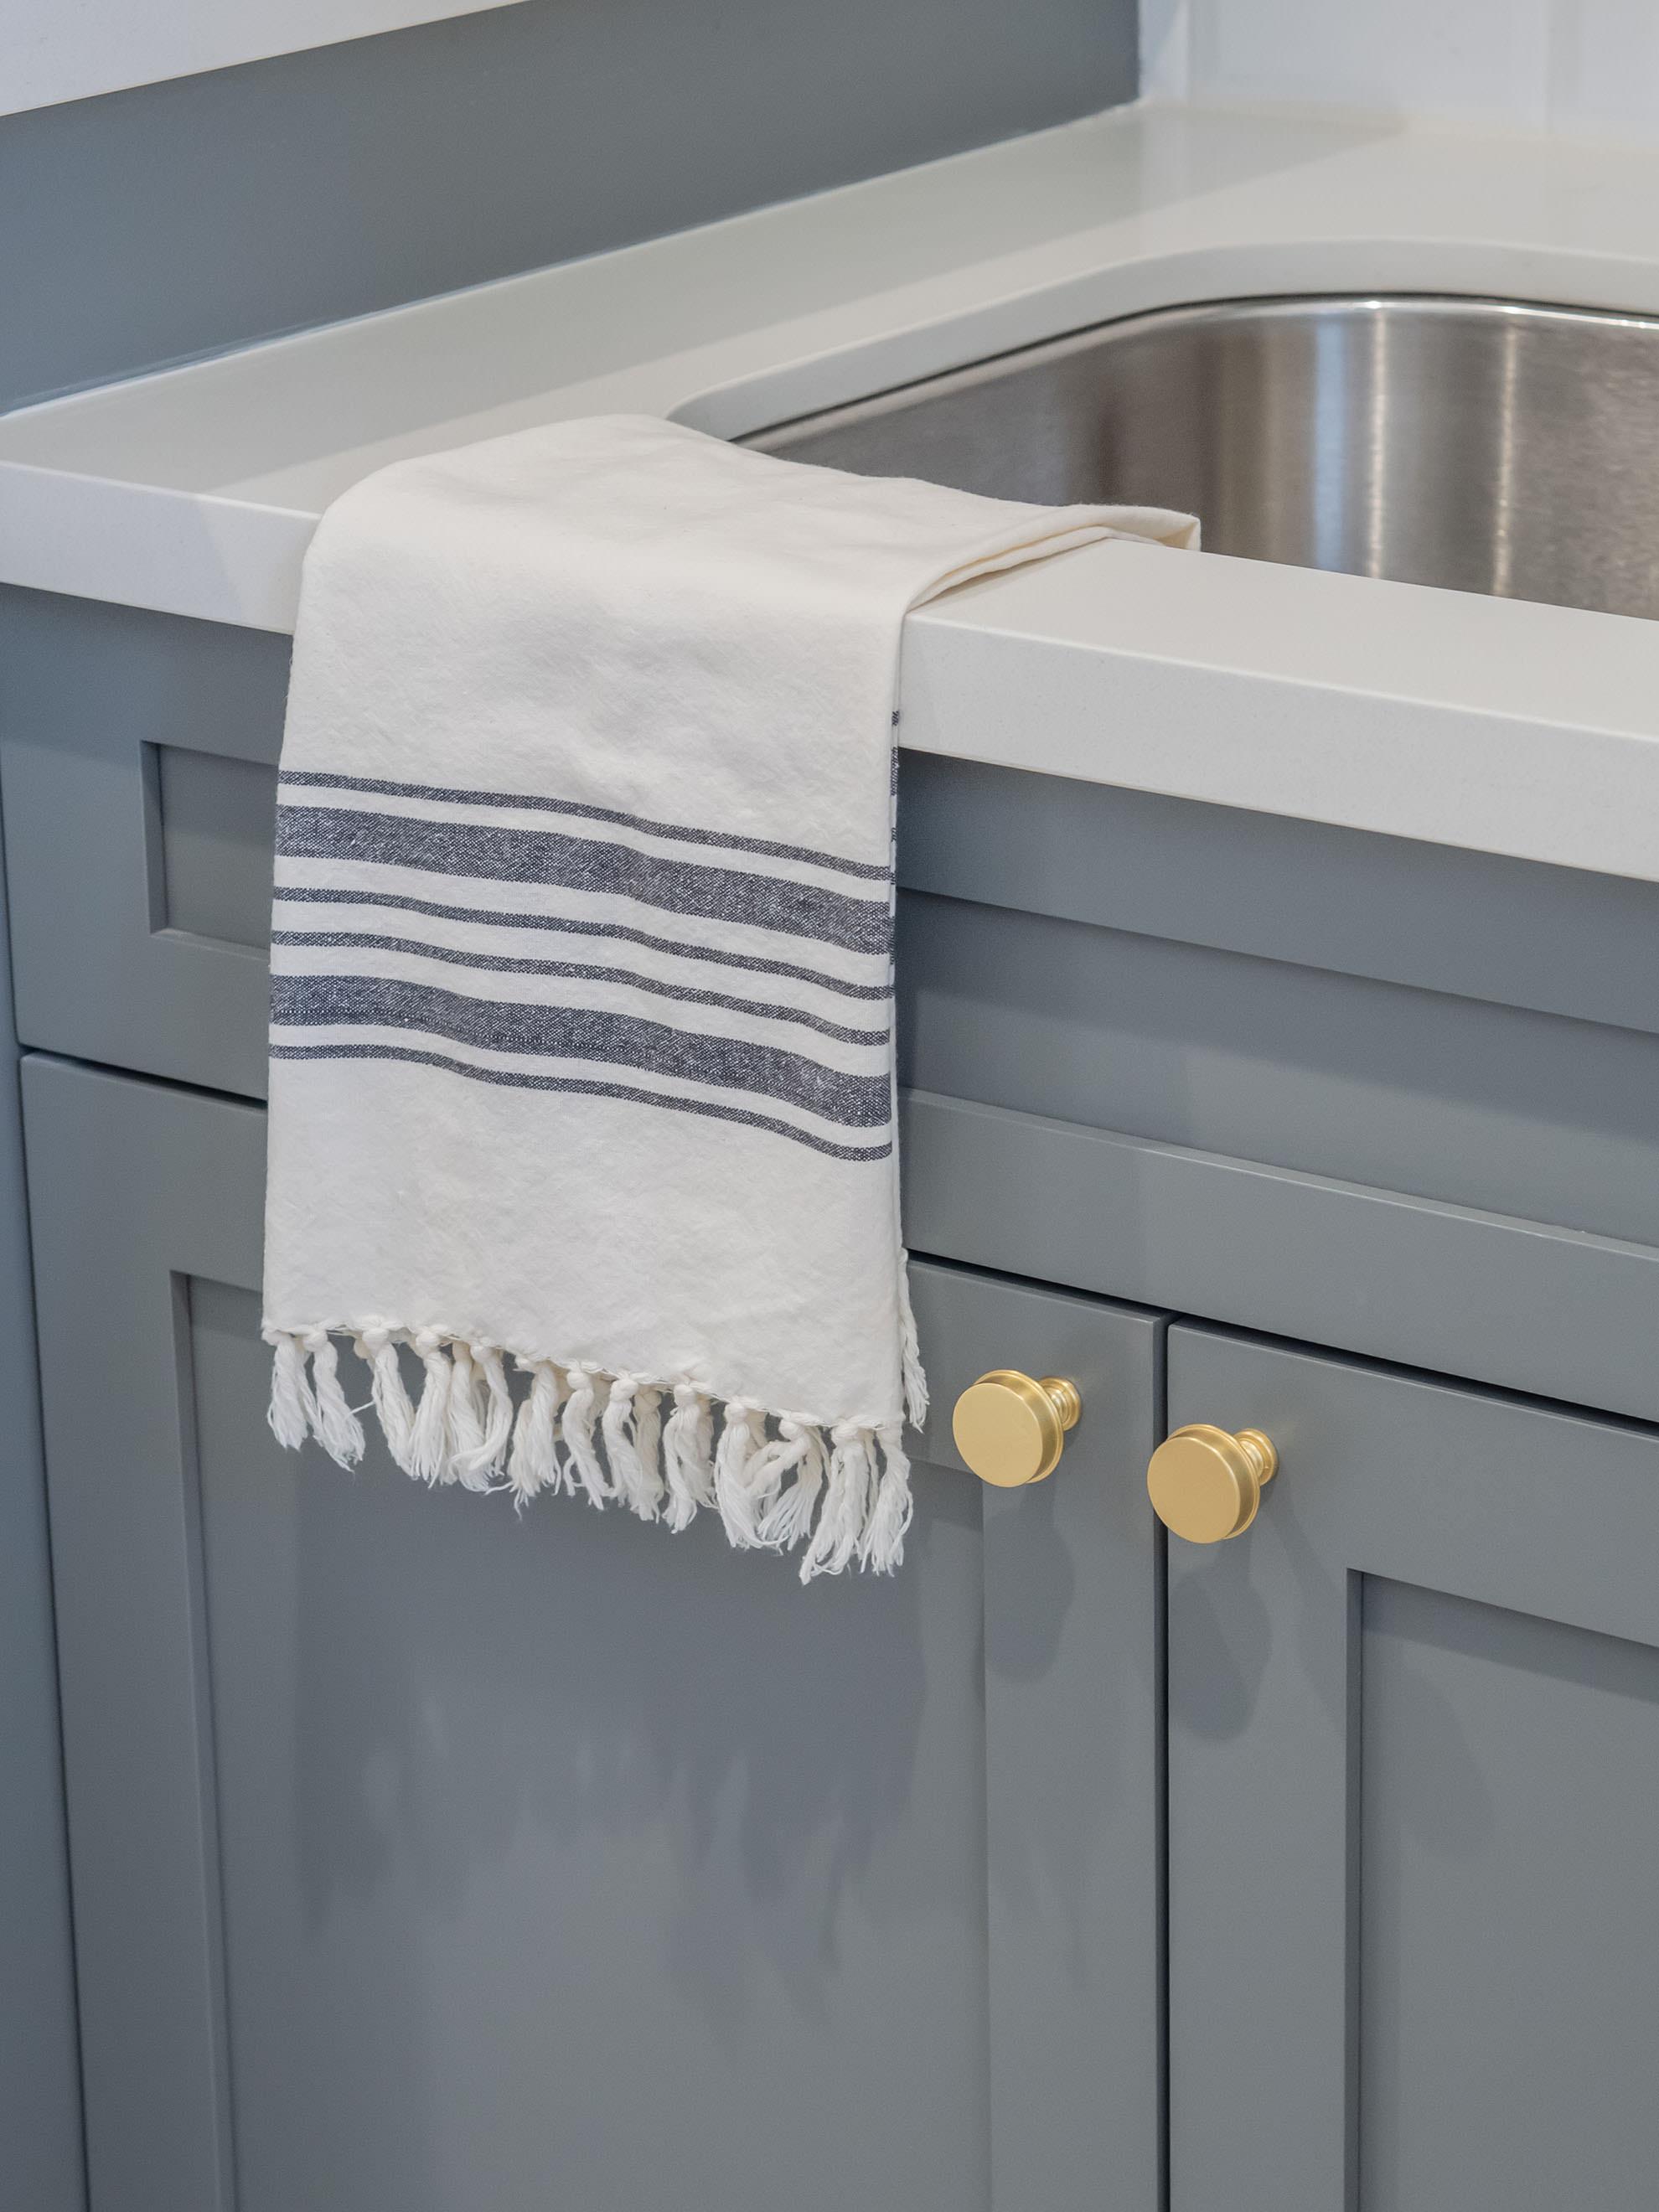 tnd-laundry-1010114.jpg